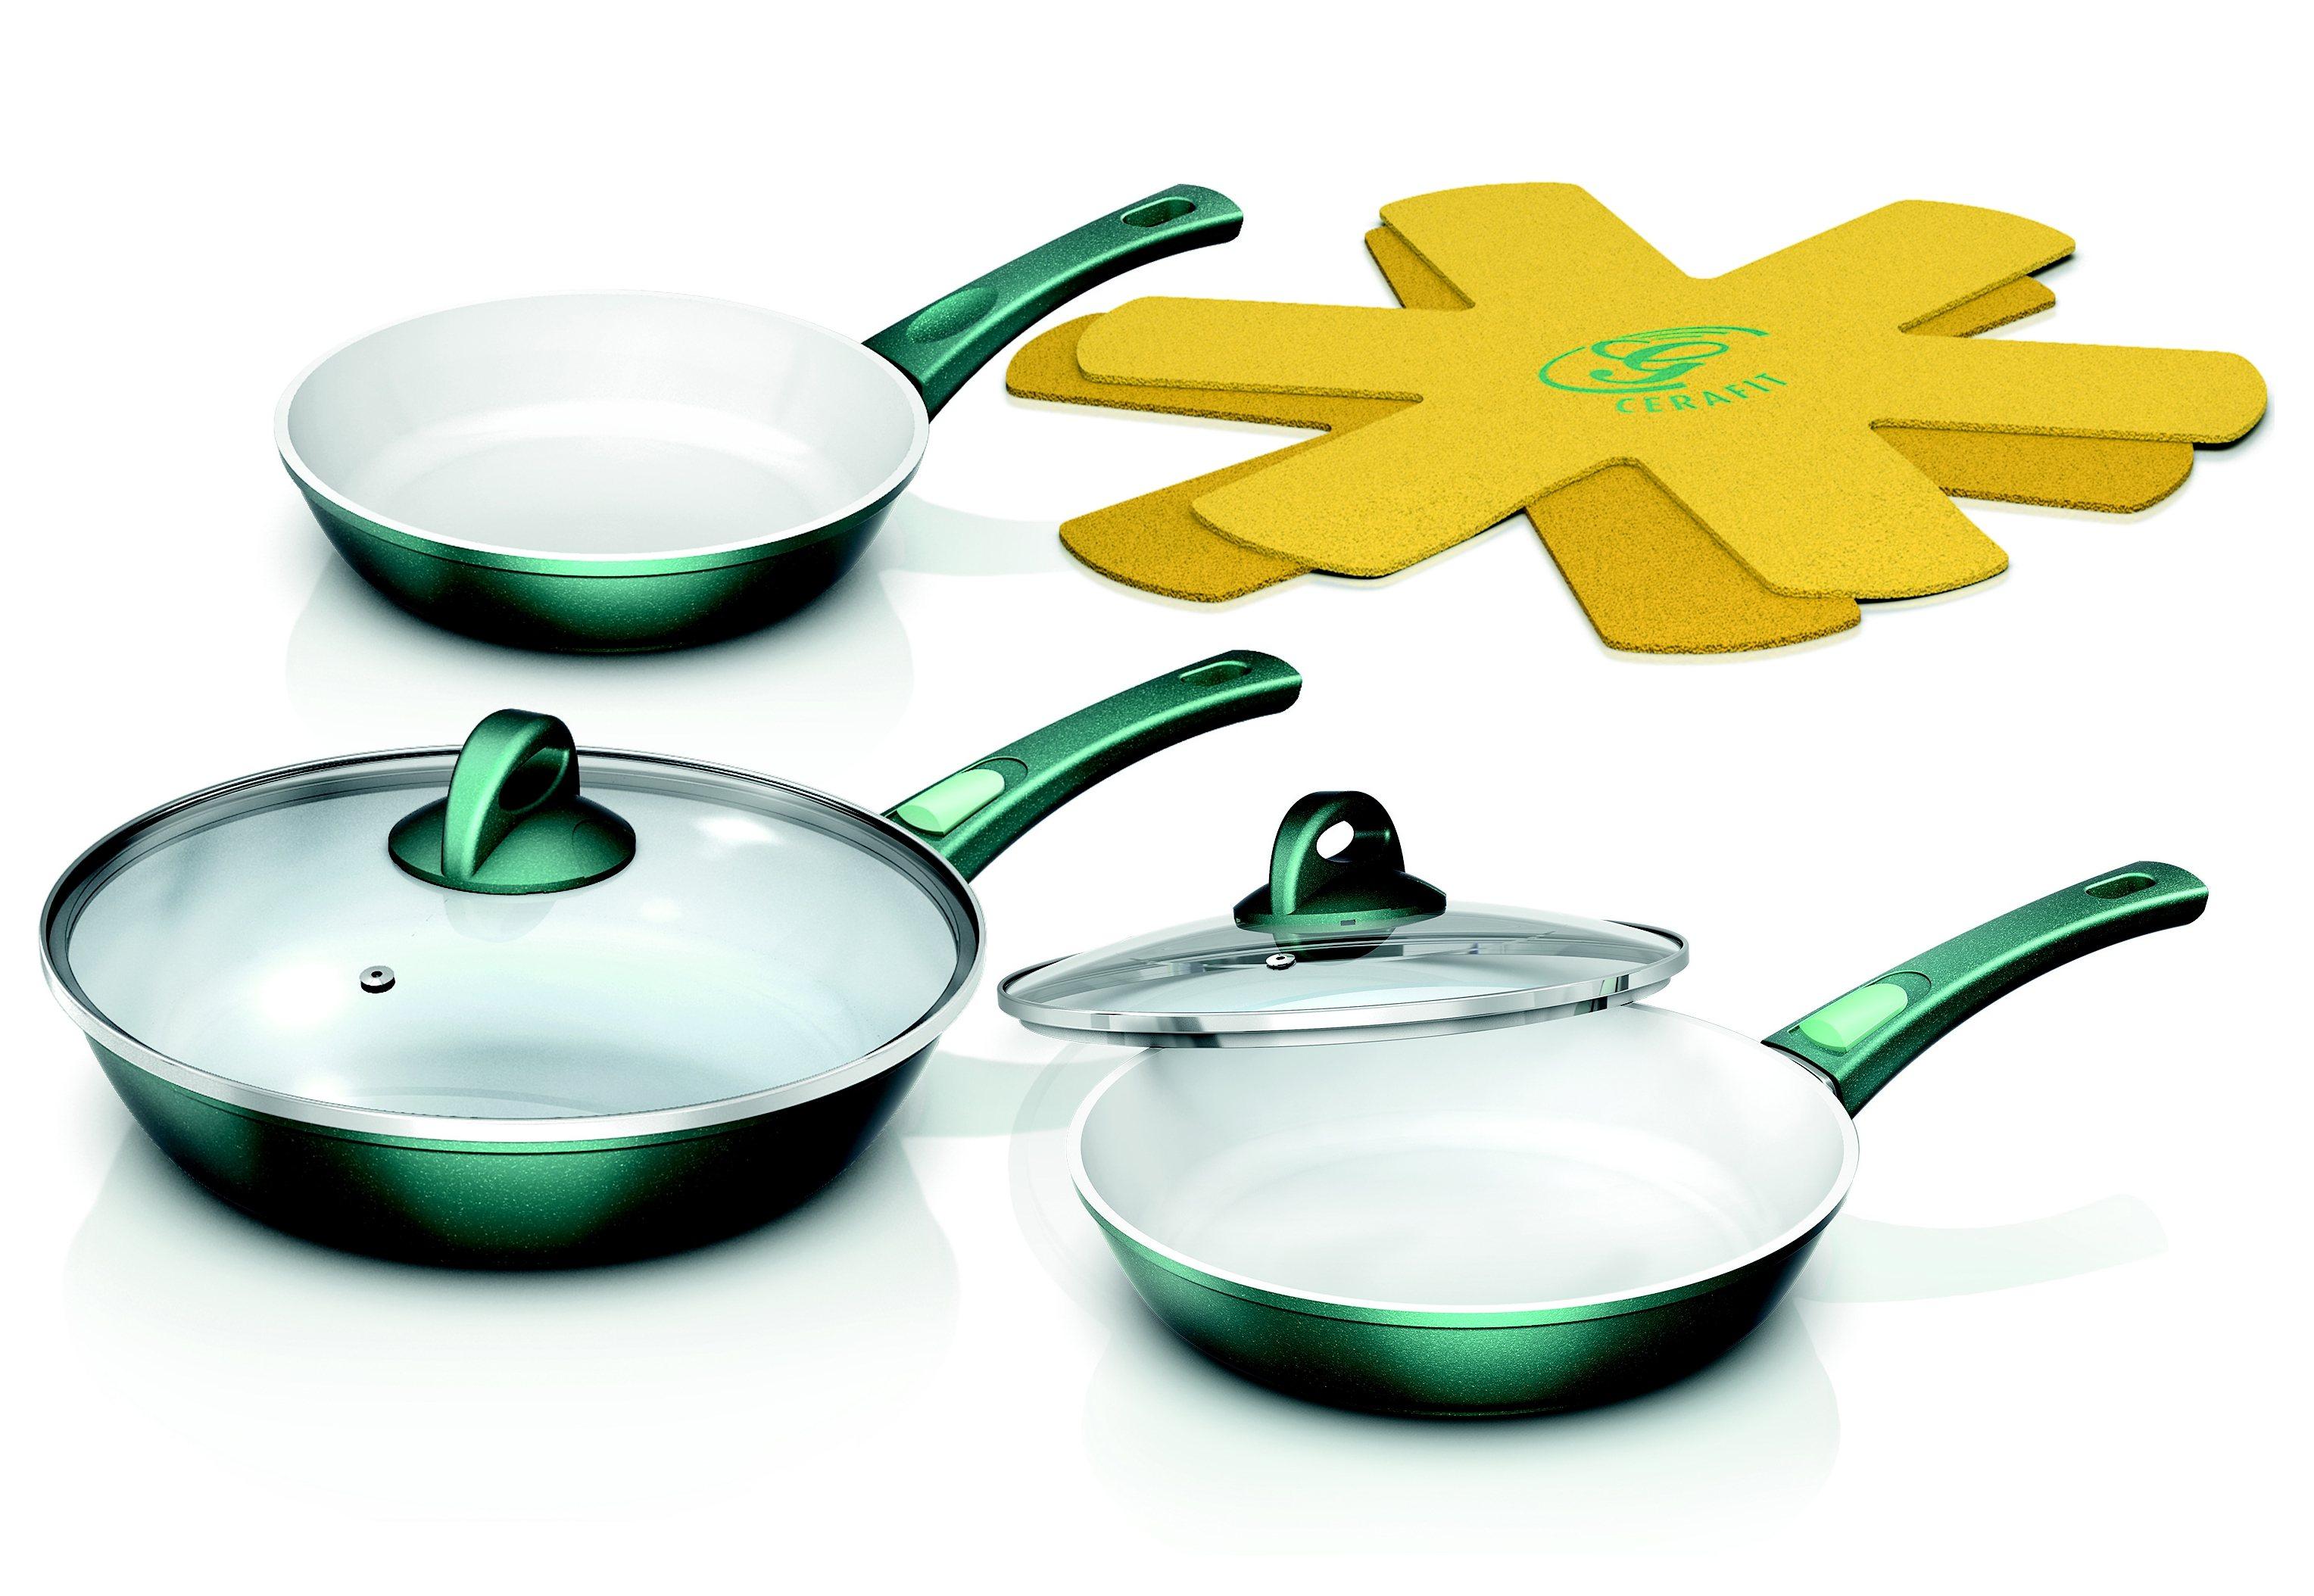 Cerafit®Fusion Pfannen-Set Smaragdgrün Edition, ® (7tlg.), Induktion